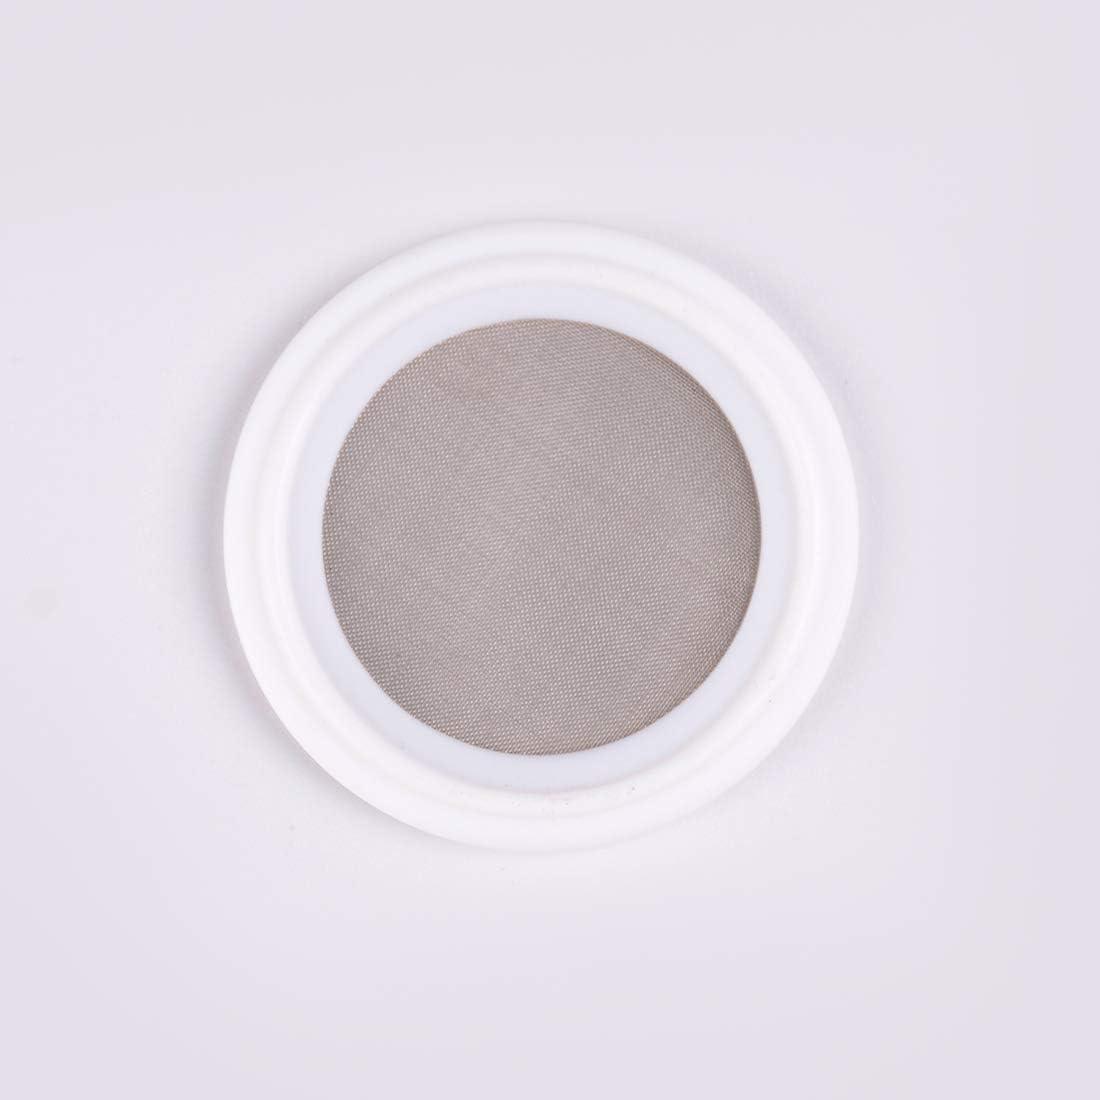 1.5 50 Mesh PTFE Sanitary Tri-Clamp Screen Gasket 318 Micron Mesh Gasket